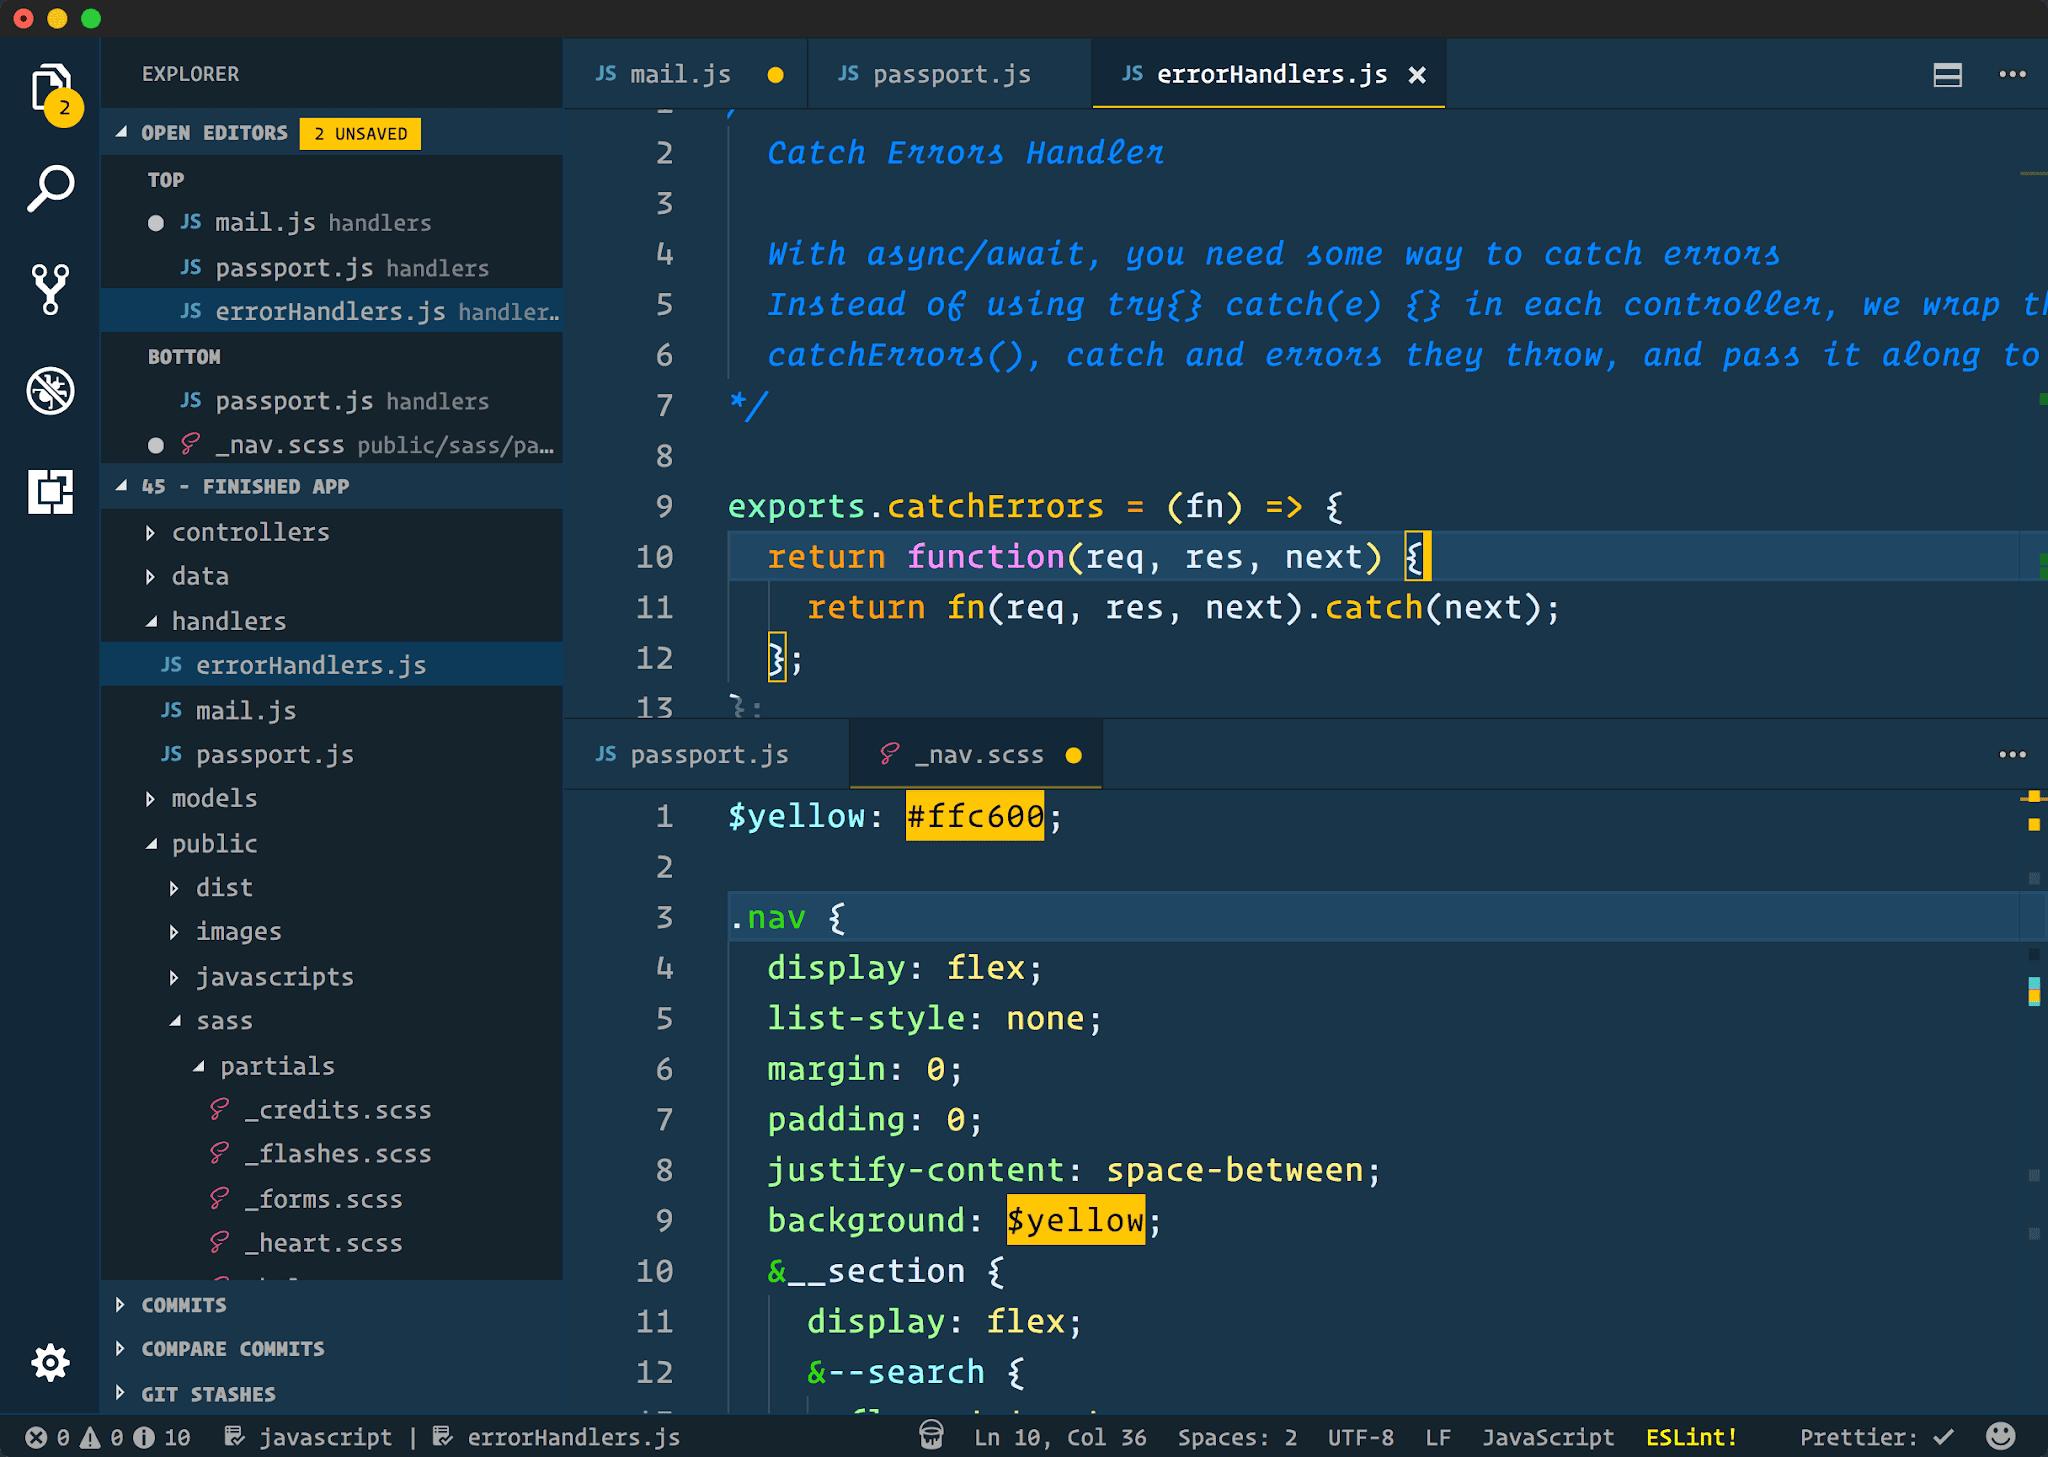 cobalt2 theme in vs code 2021